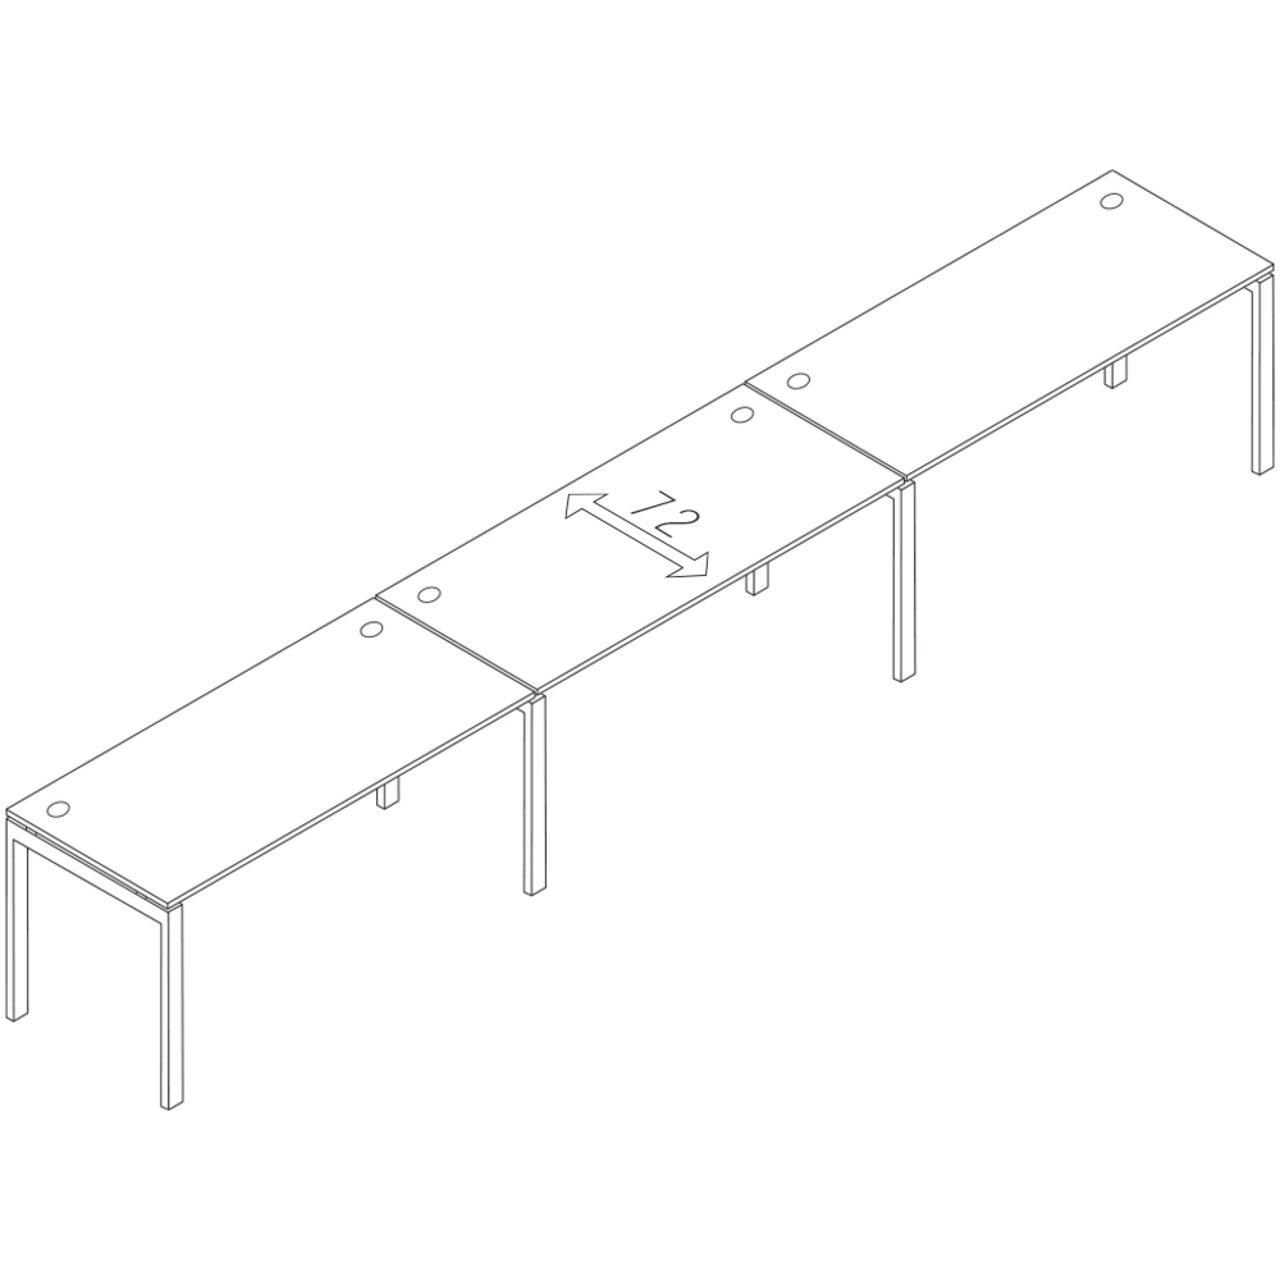 Бенч-система на 3 места линейная  TREND 420x72x75 - фото 1